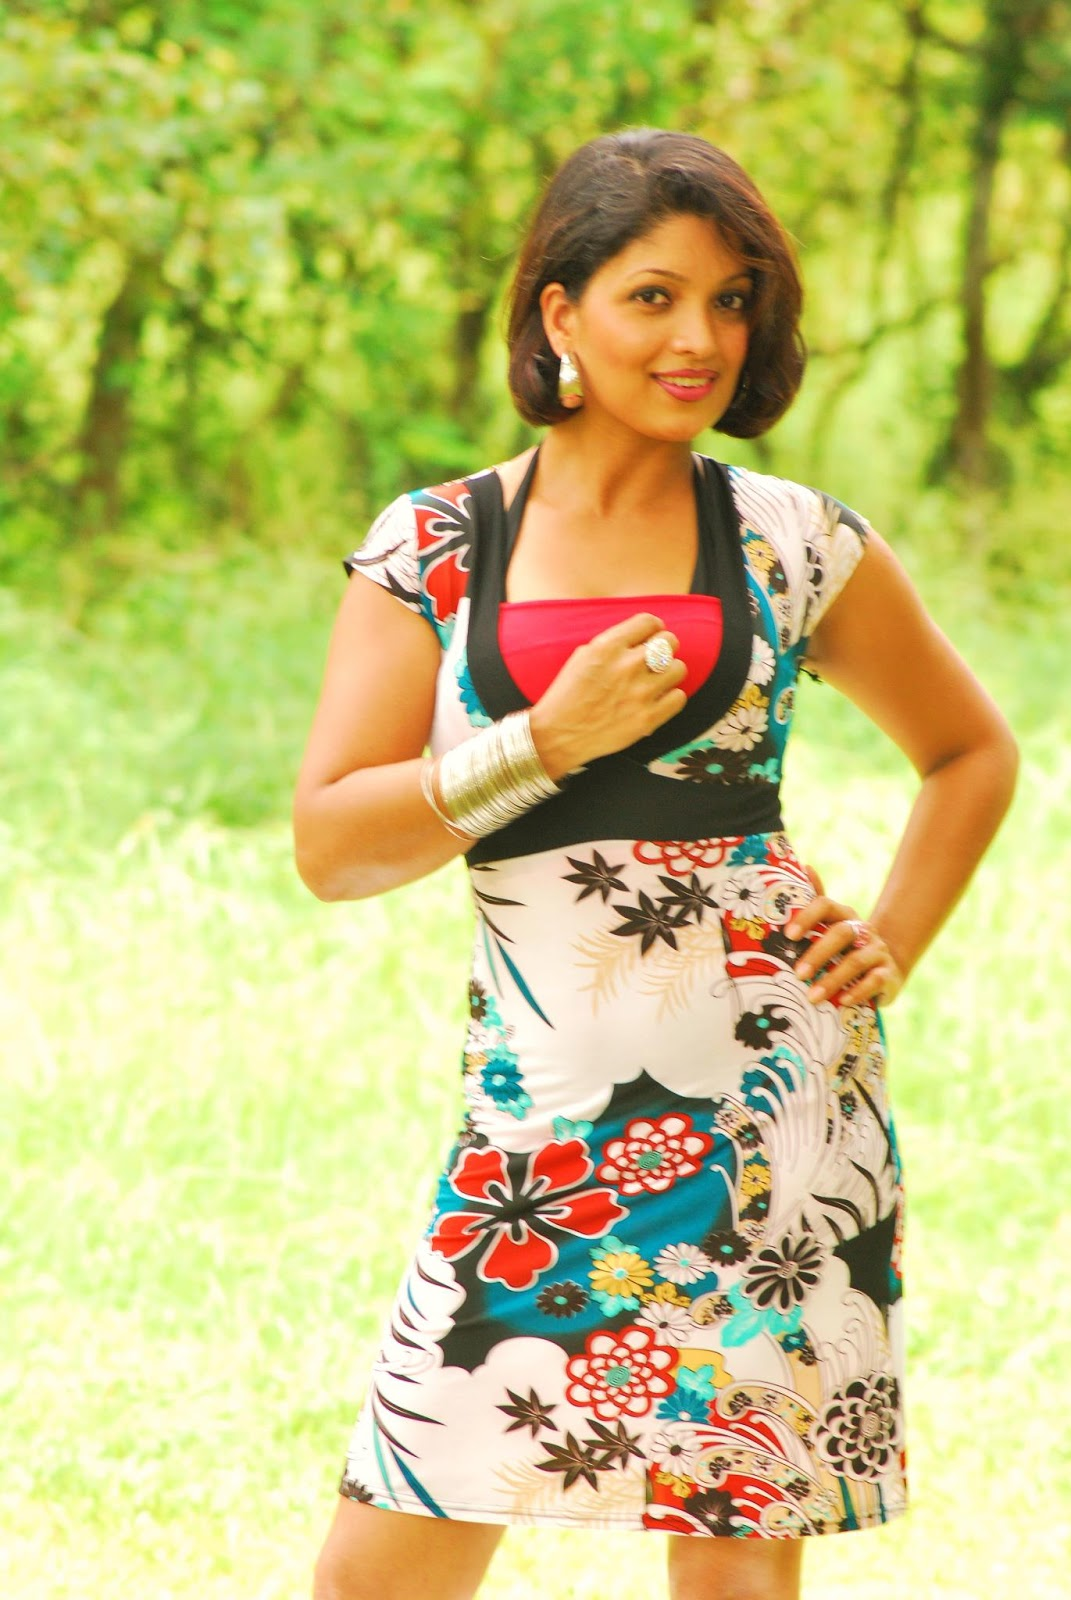 Sri Lankan Actress And Models: Nirosha Perera